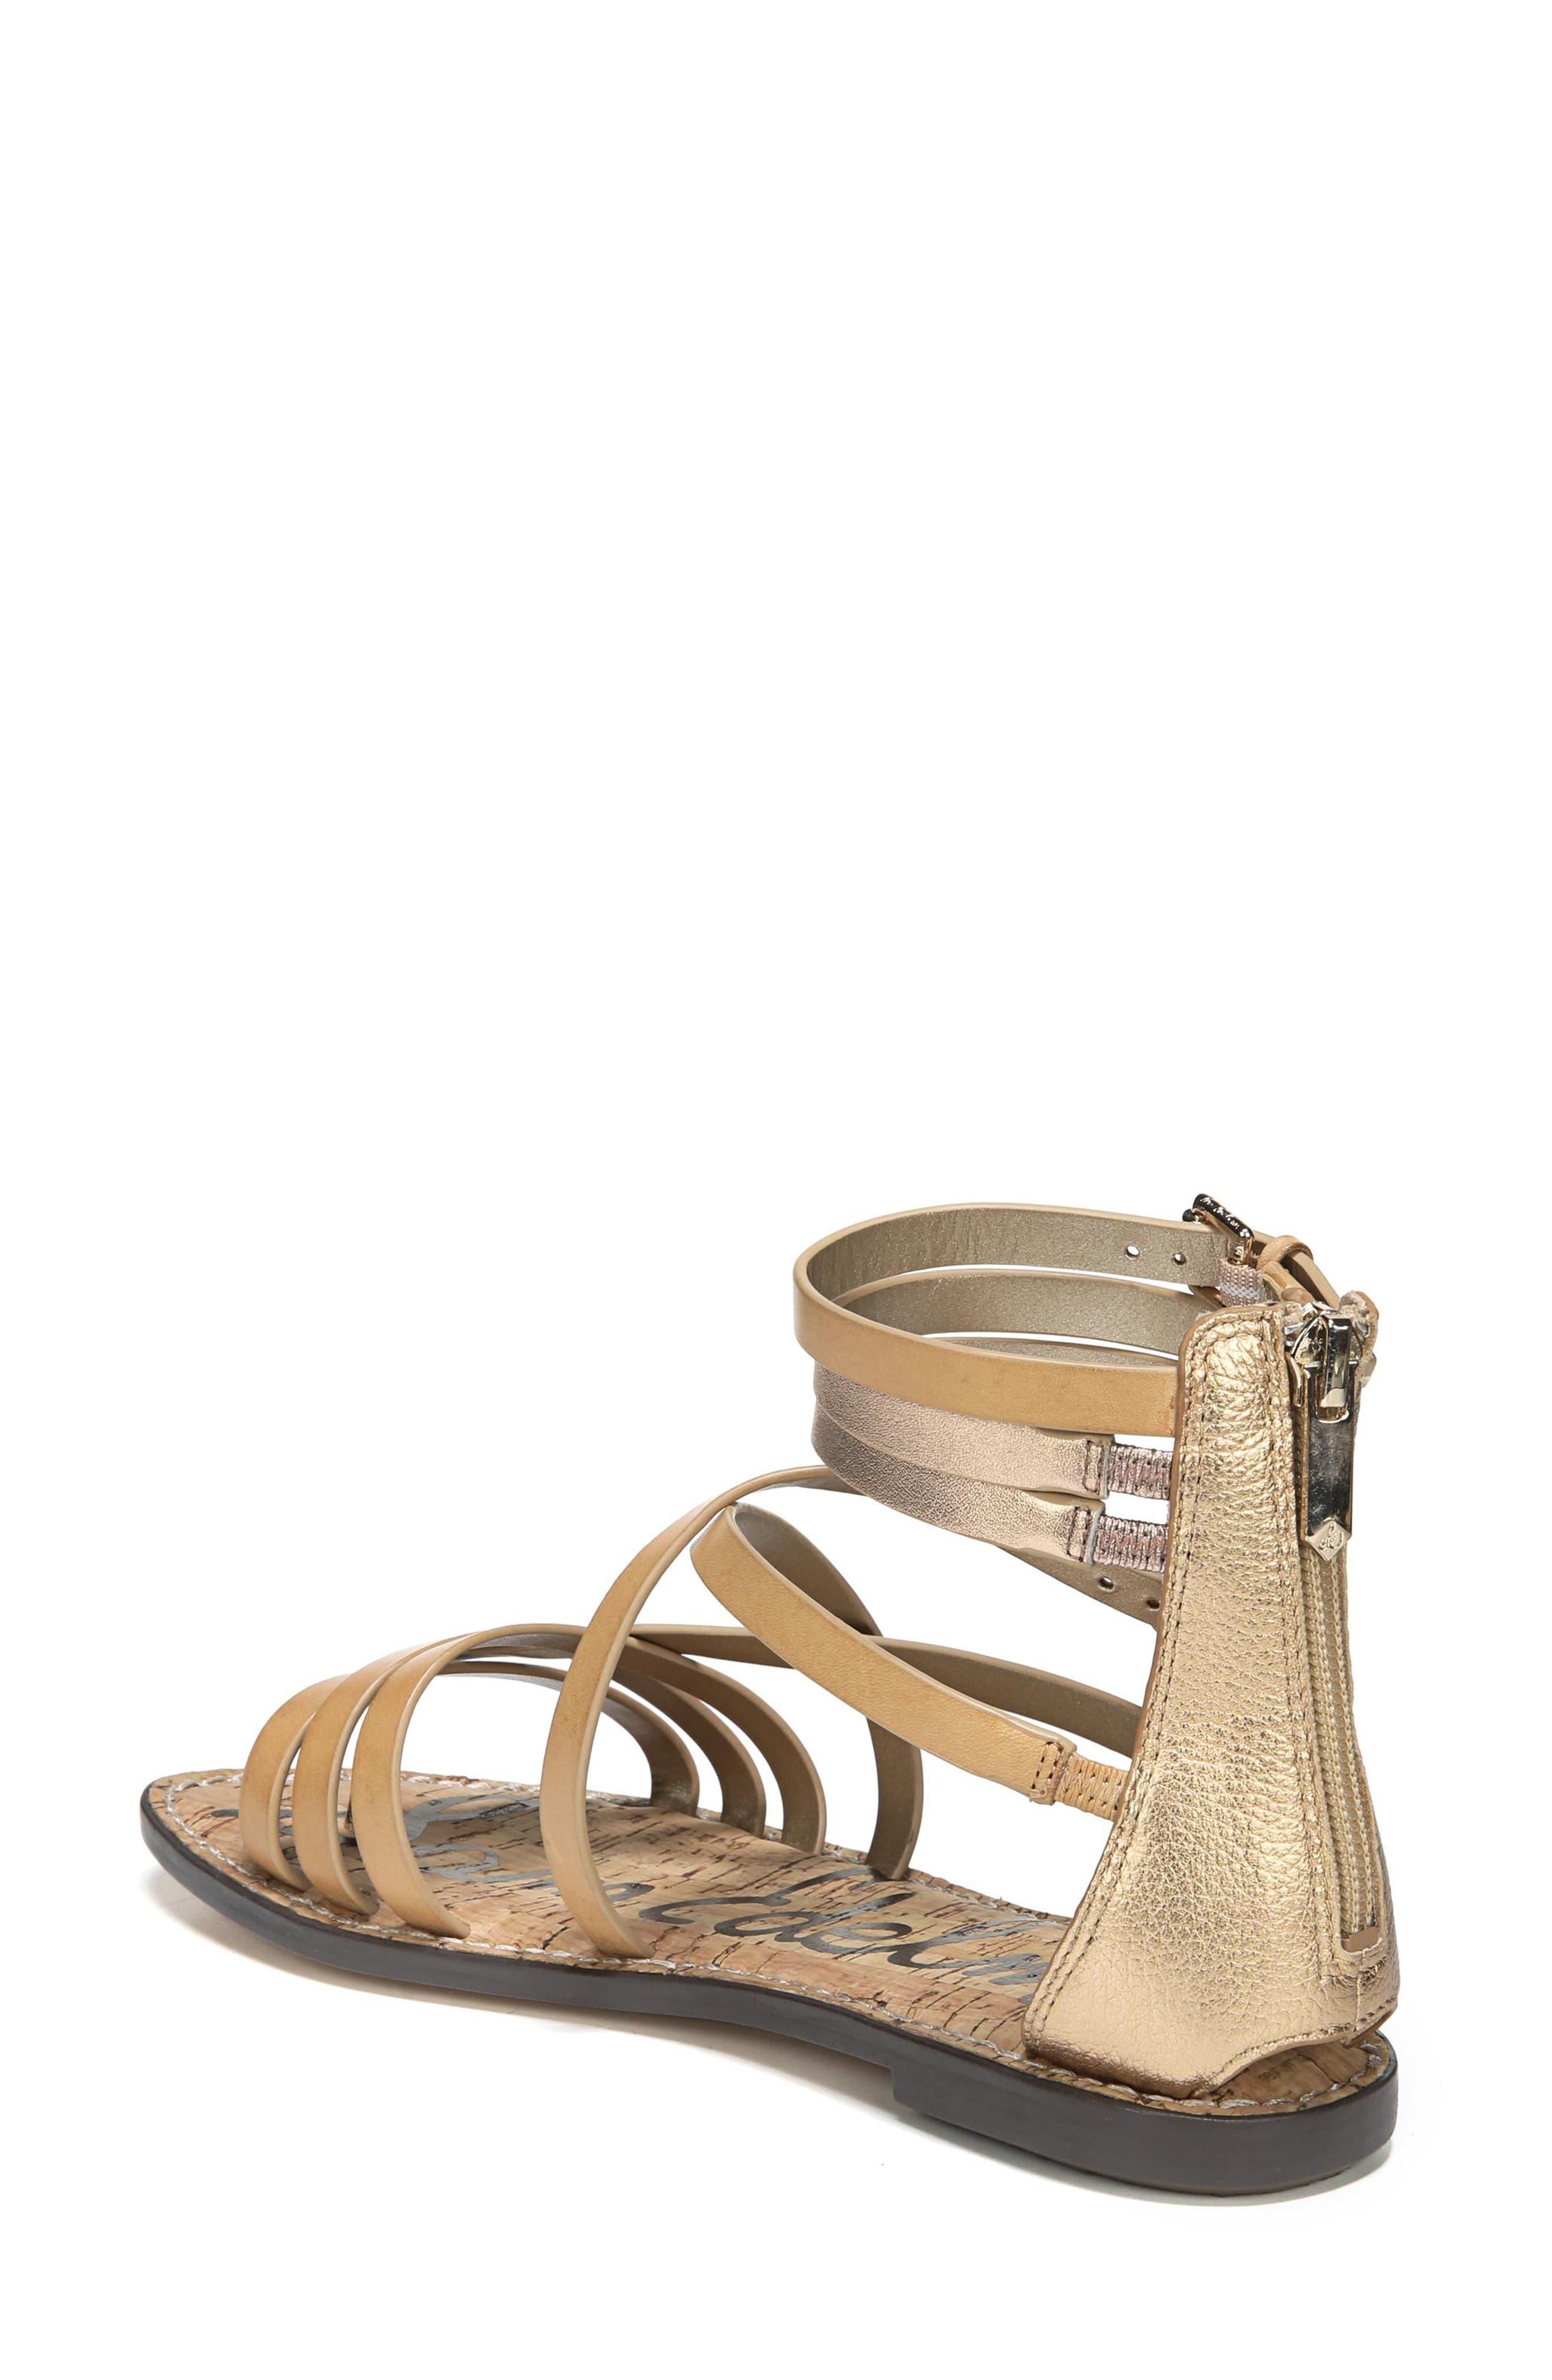 Ganesa Strappy Sandal,                             Alternate thumbnail 2, color,                             Golden Caramel Leather